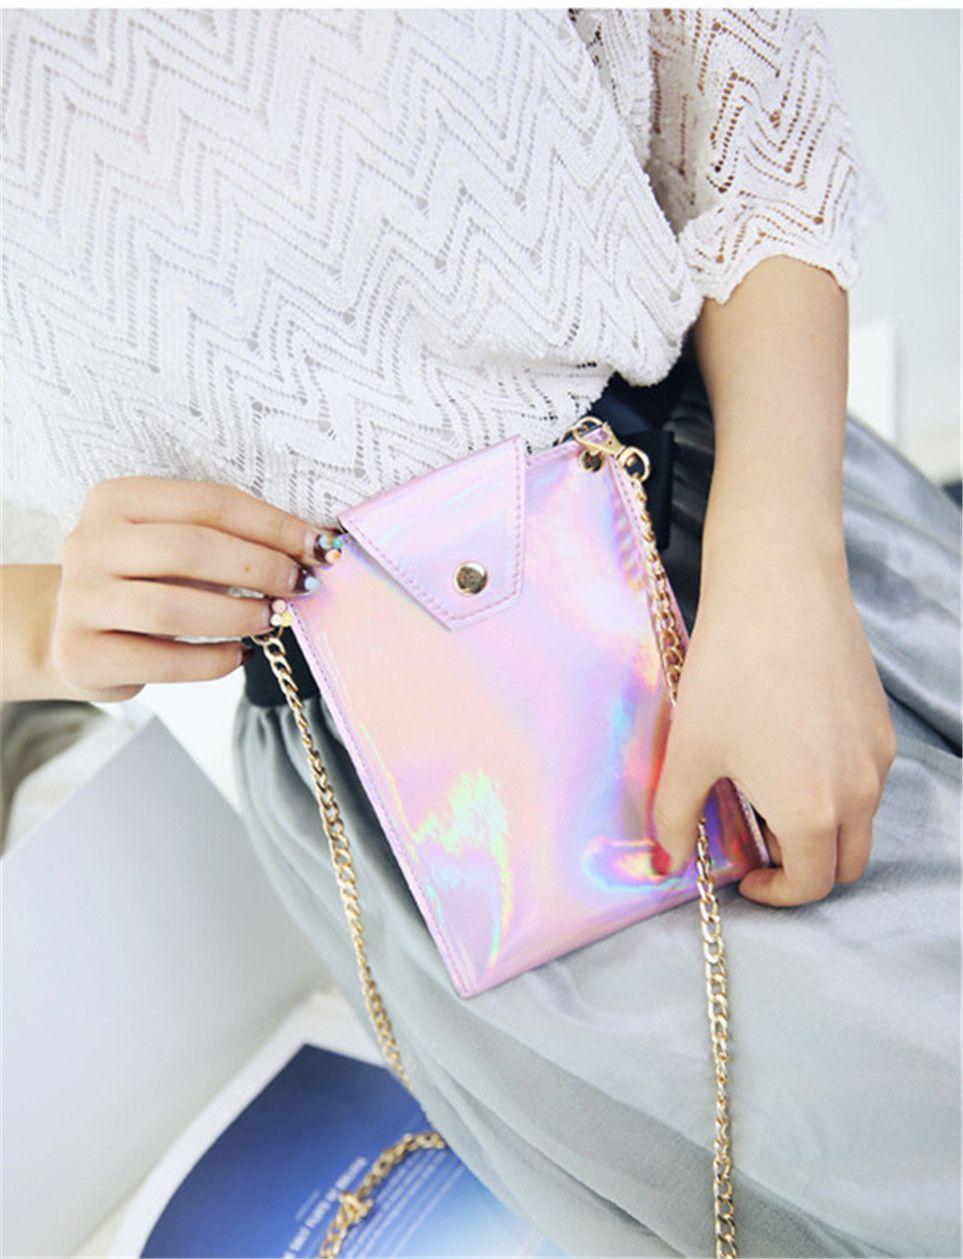 2017 Laser Mobile Phone Bags Shoulder Bags New Arrival Best Selling High Quality Elegant Fashionable